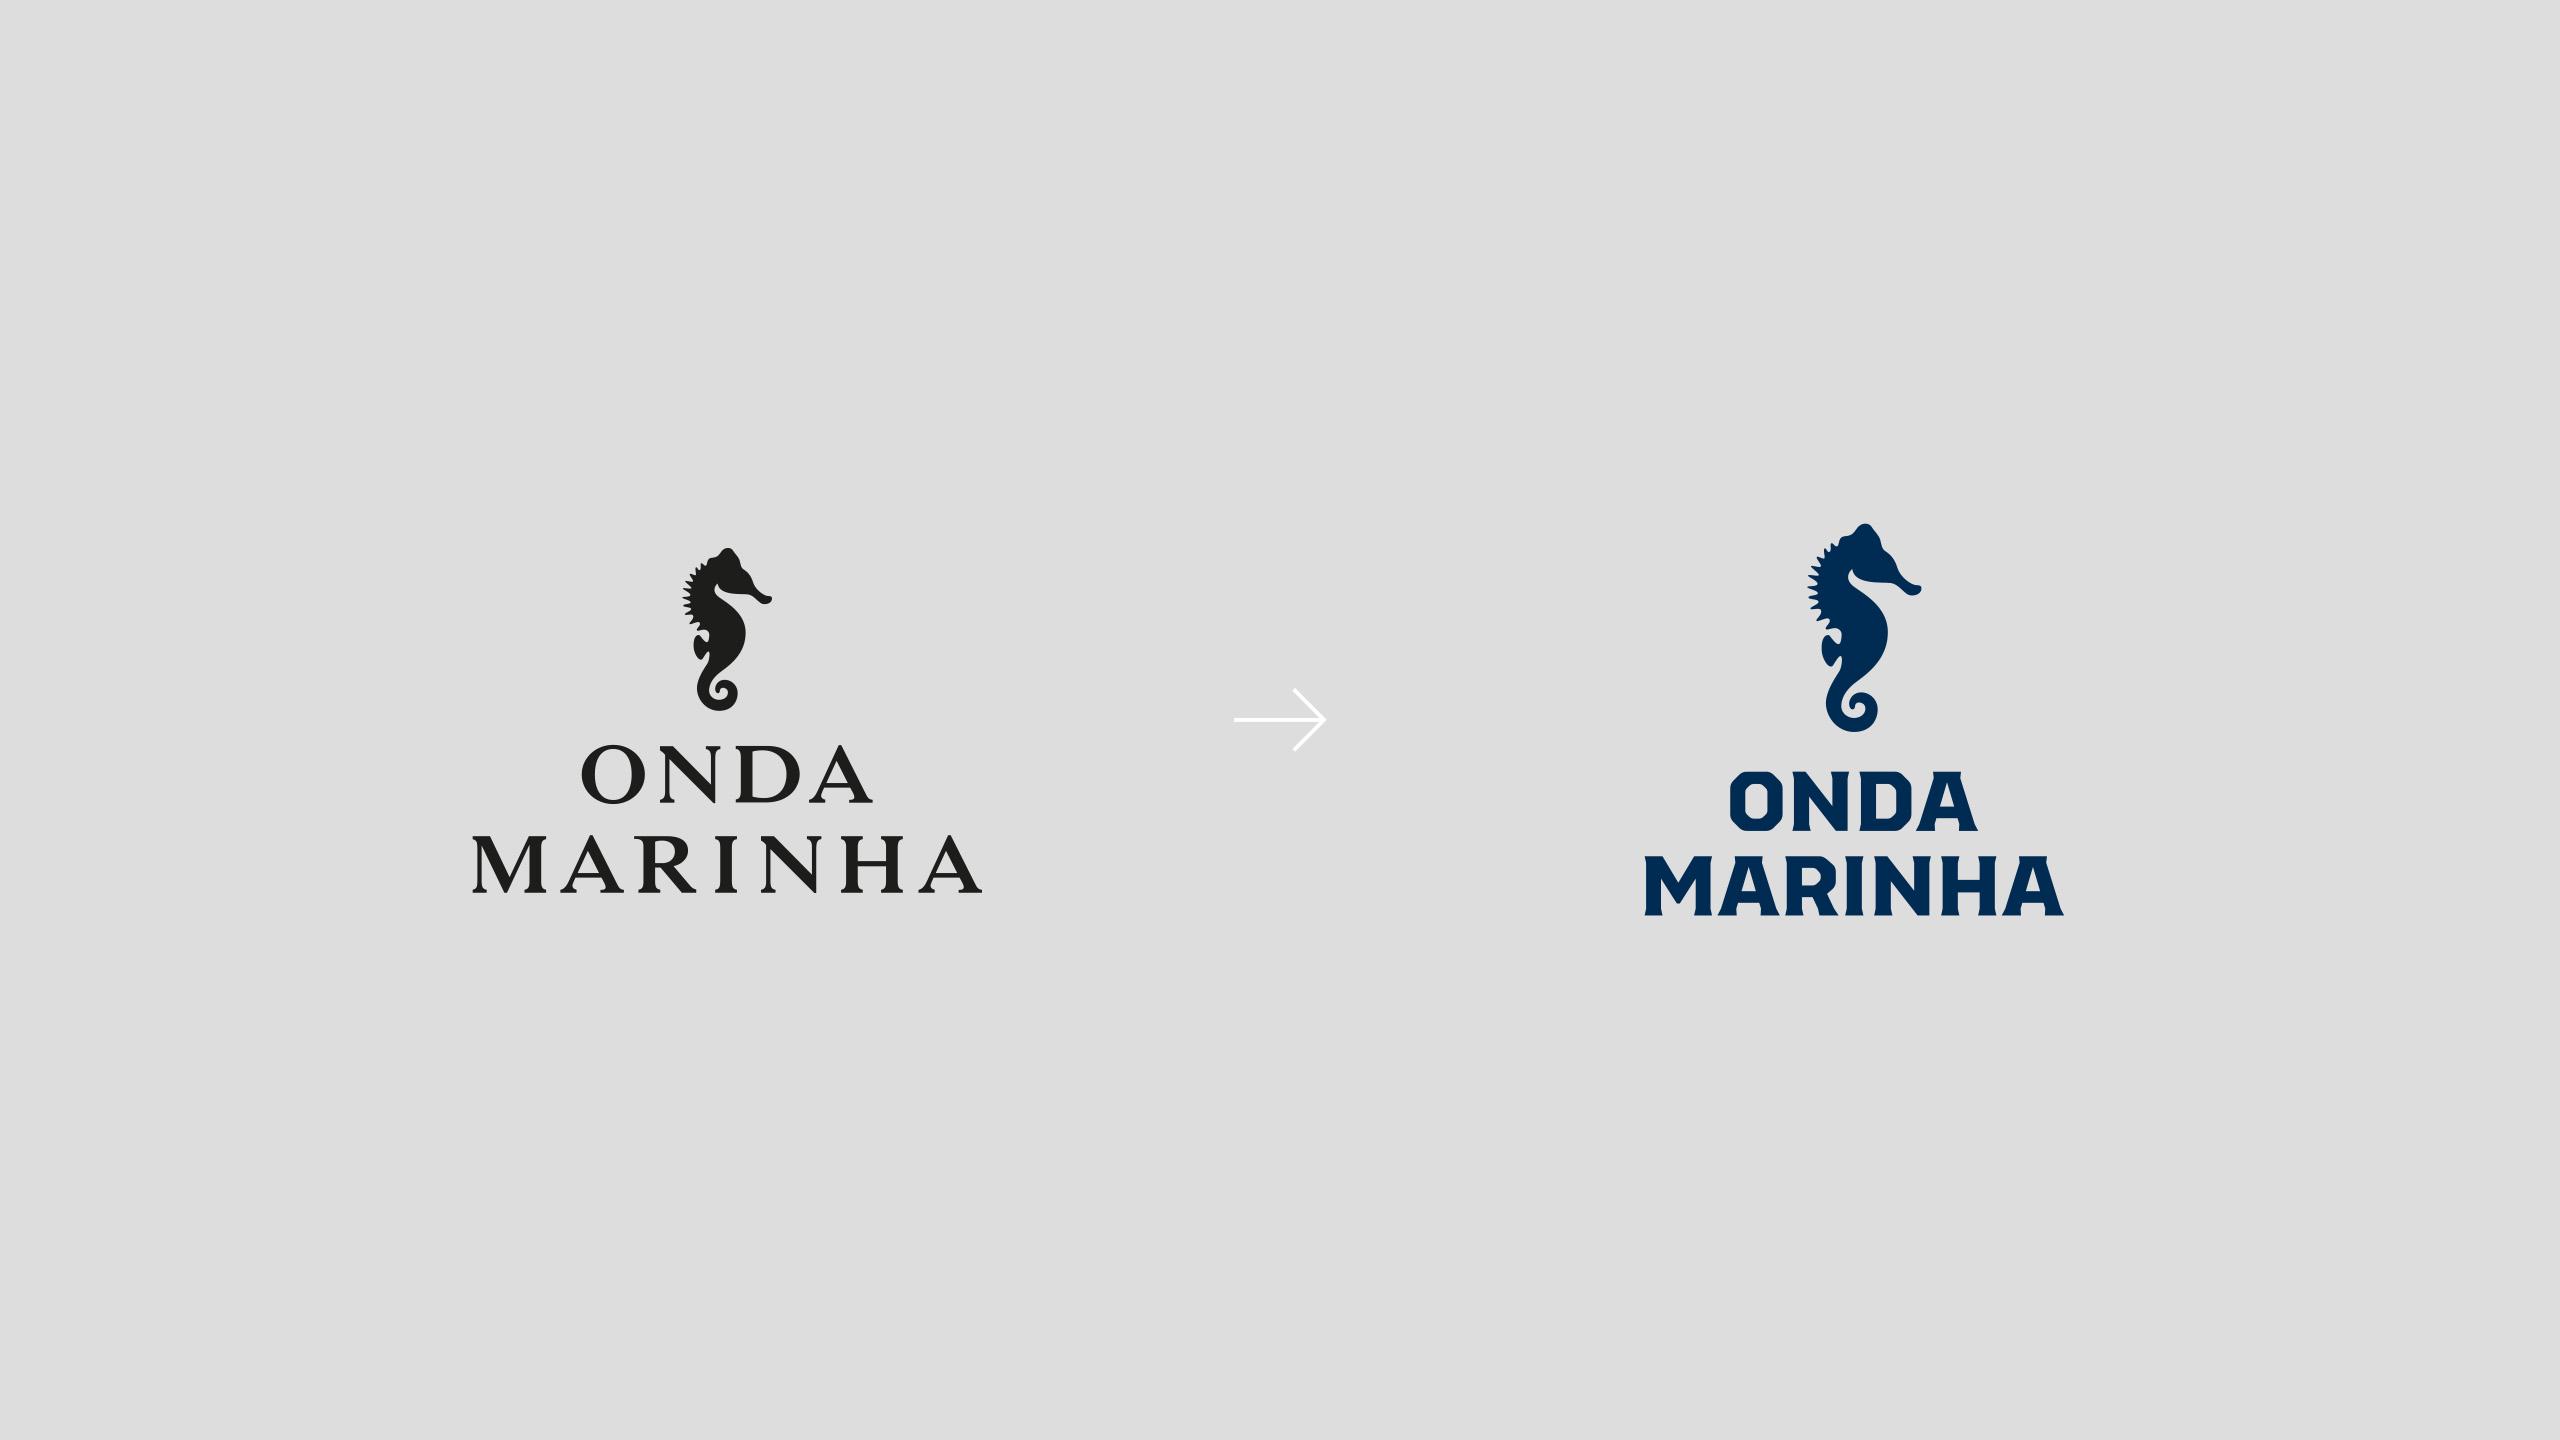 firmorama_onda-marinha_02